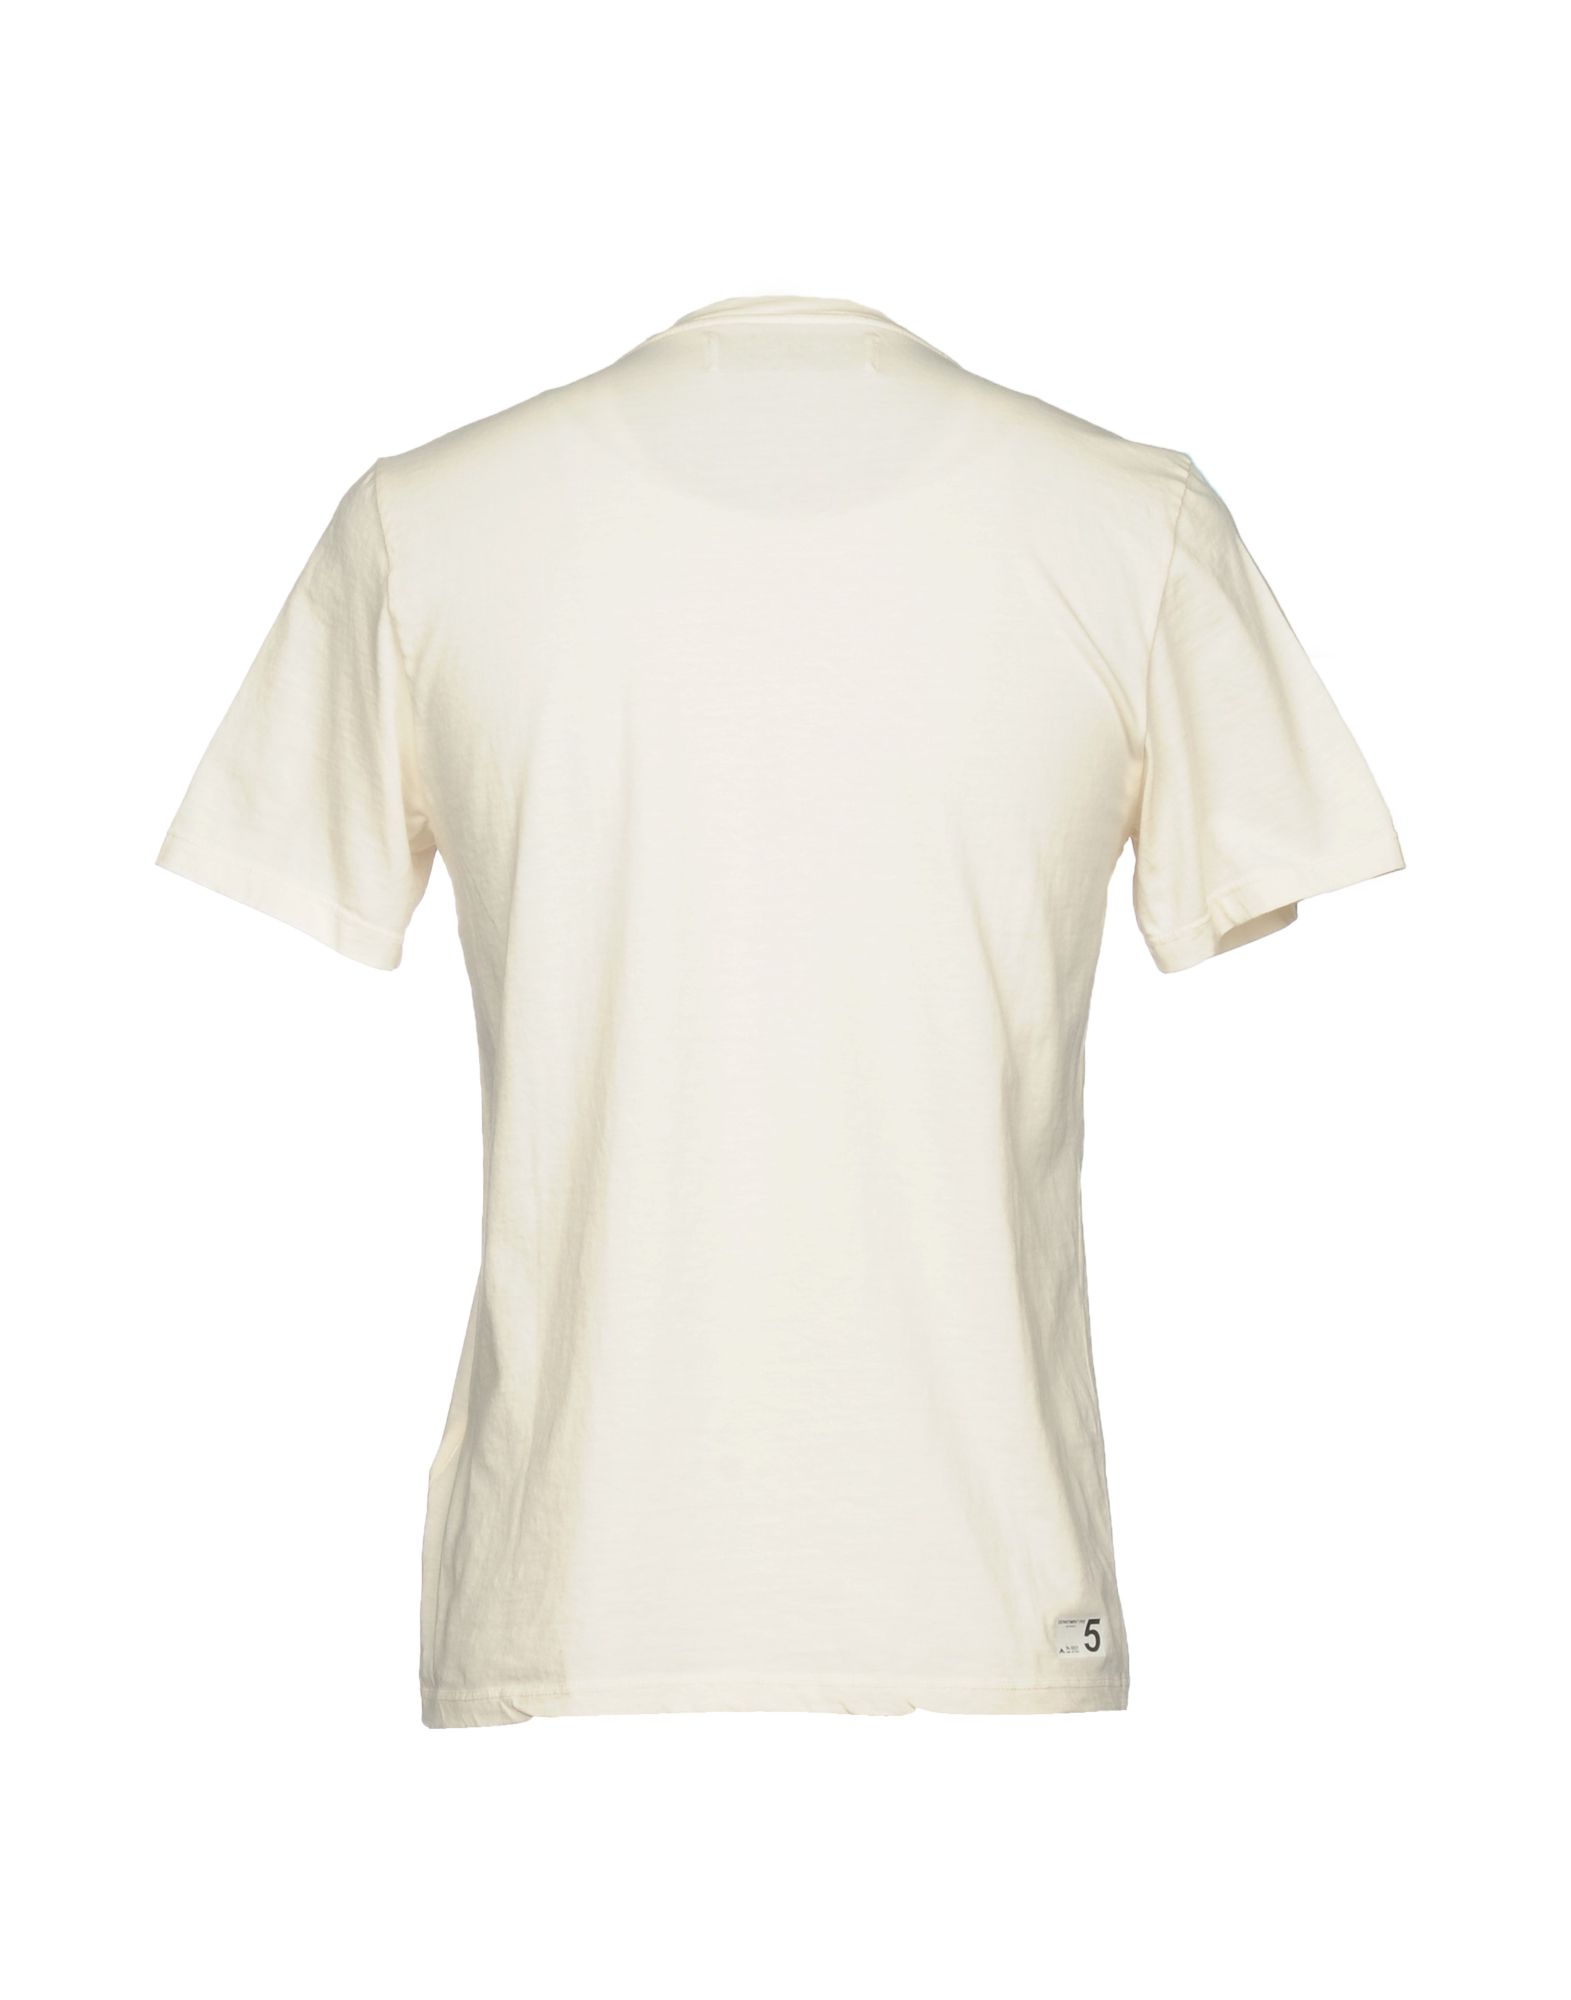 T-Shirt Department 5 5 Department Uomo - 12120097ER 3b9f04